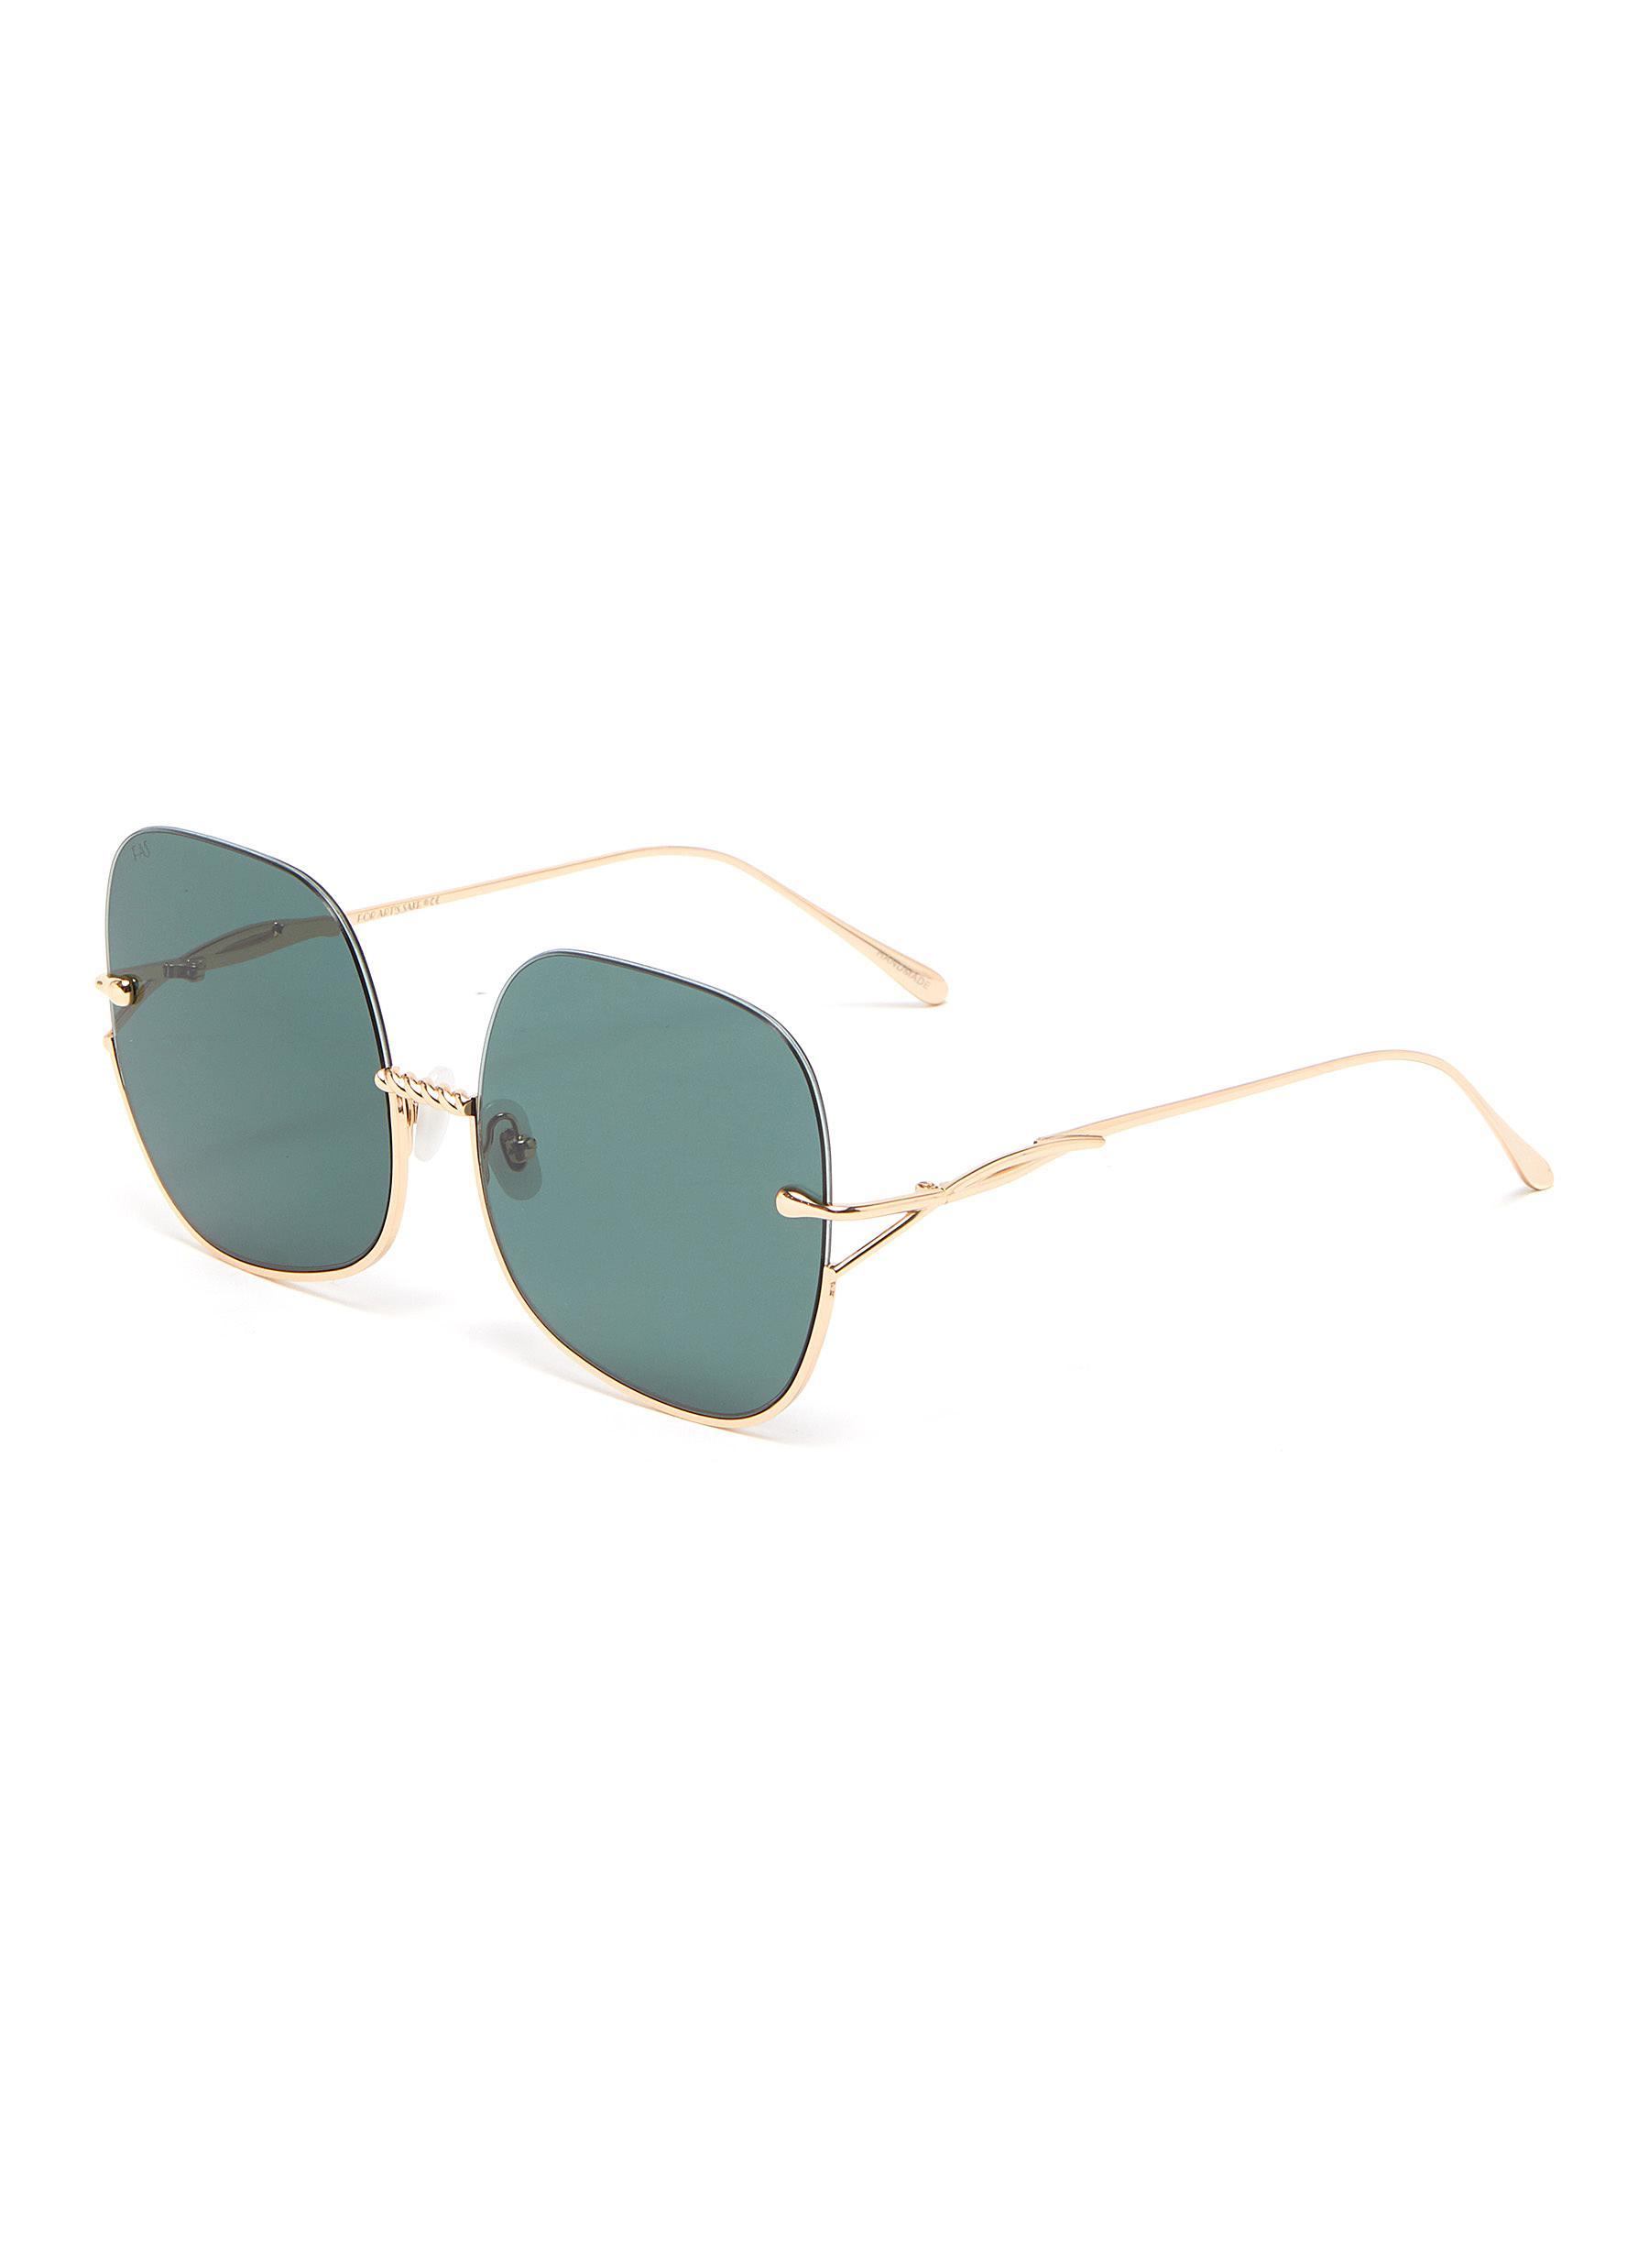 Duchess' 12k Gold Plated Half Square Frame Oversized Sunglasses